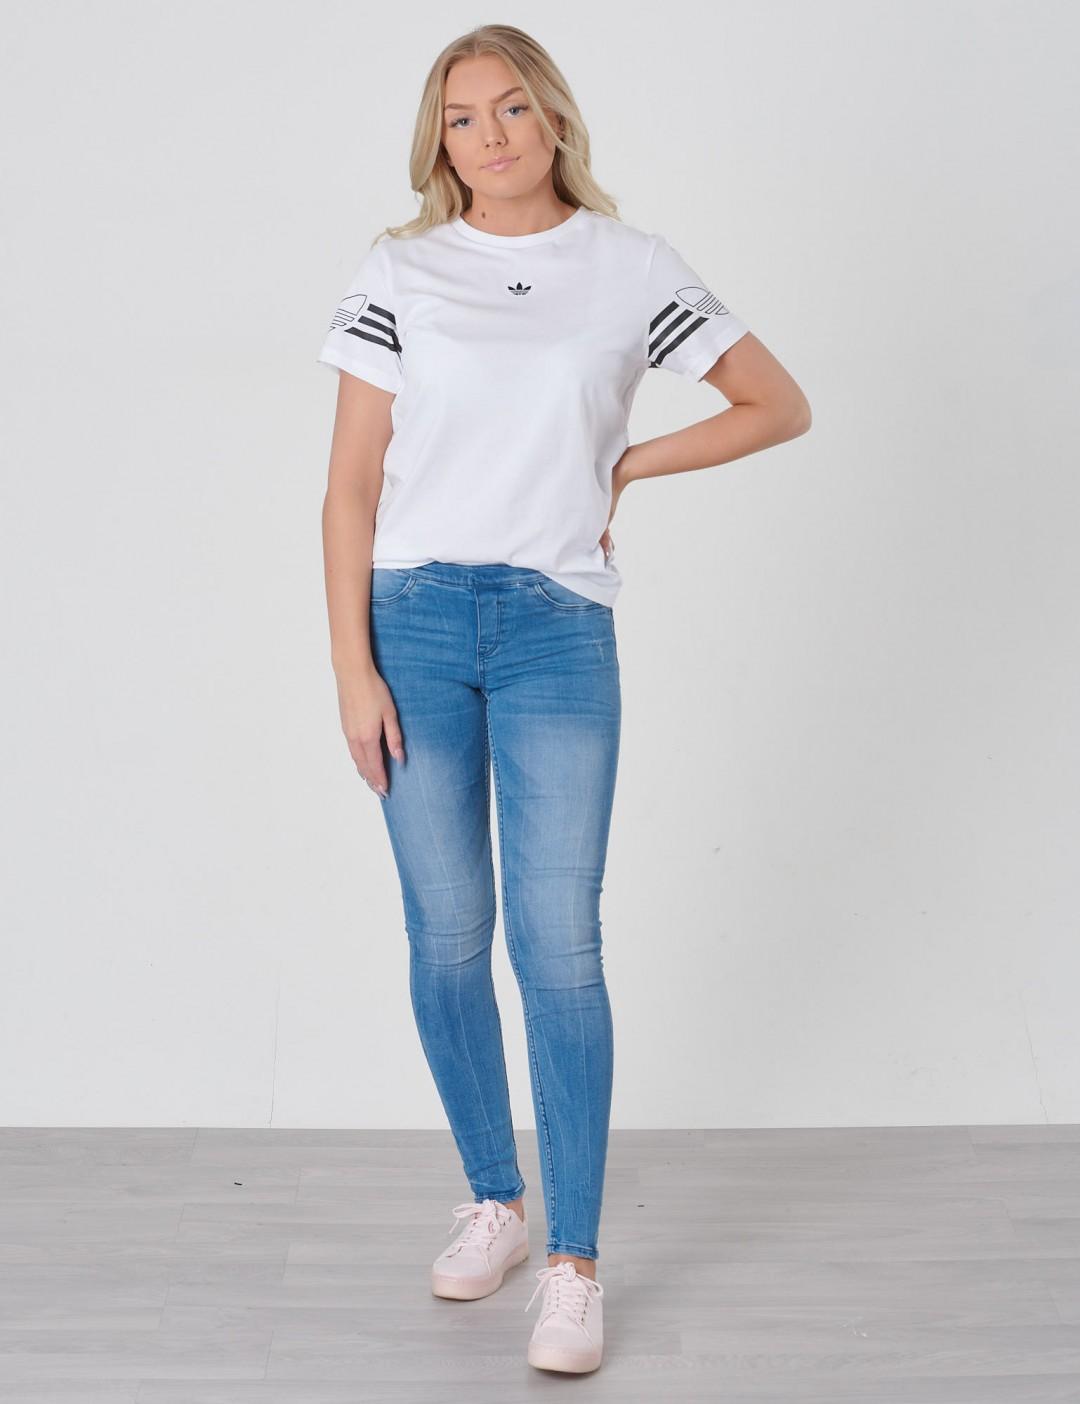 Adidas Originals barnkläder - OUTLINE TEE ... c3cb6f5056b8d